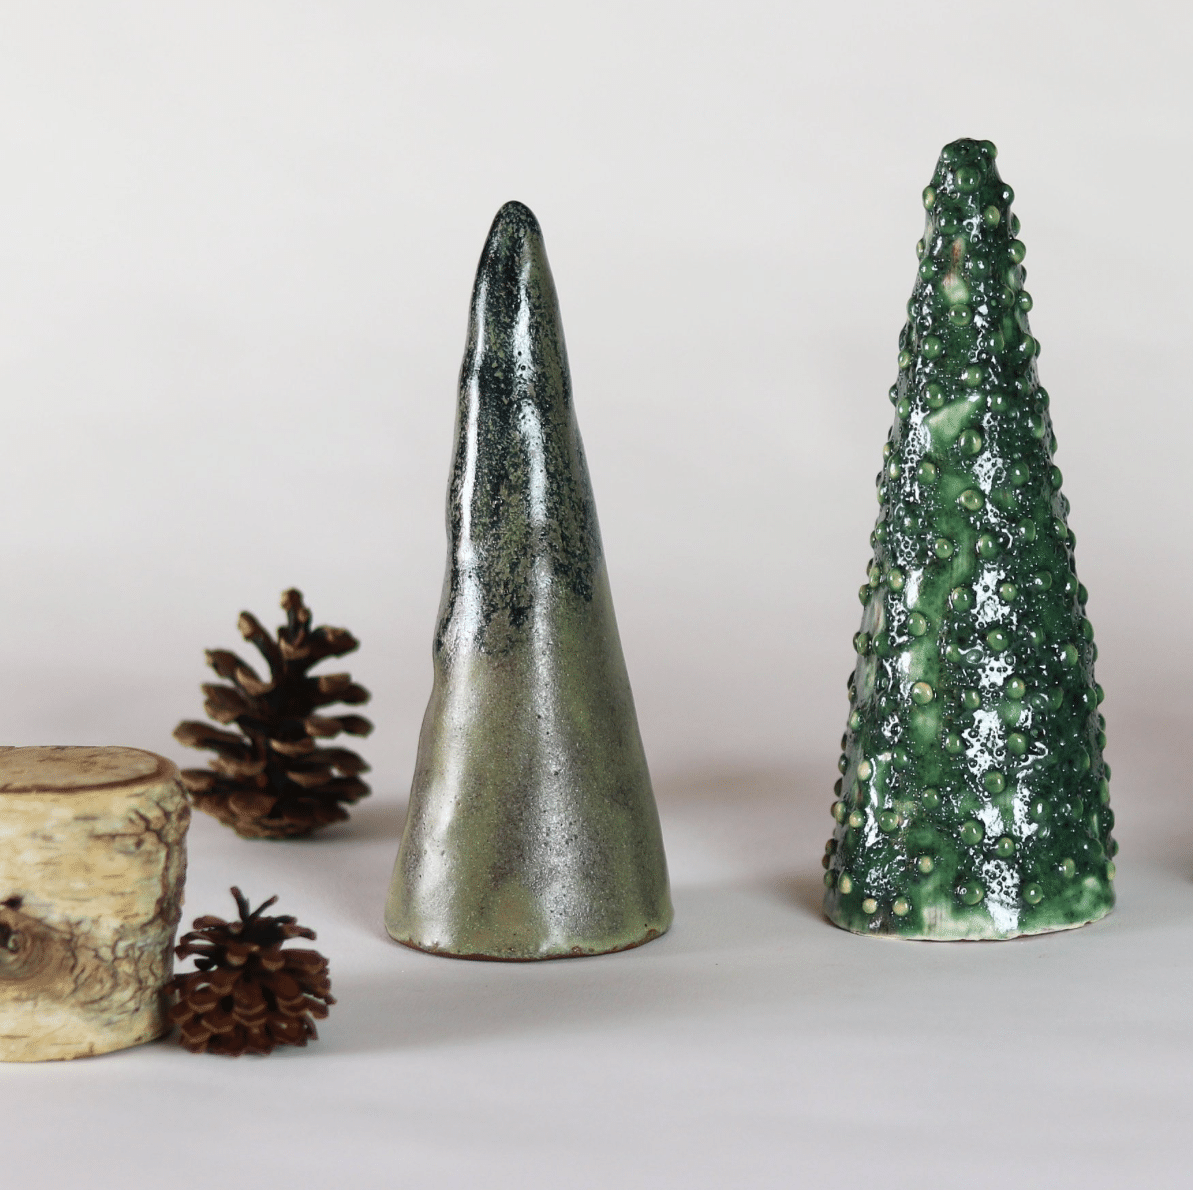 sapin de noel ceramique made in france artisanat ethique